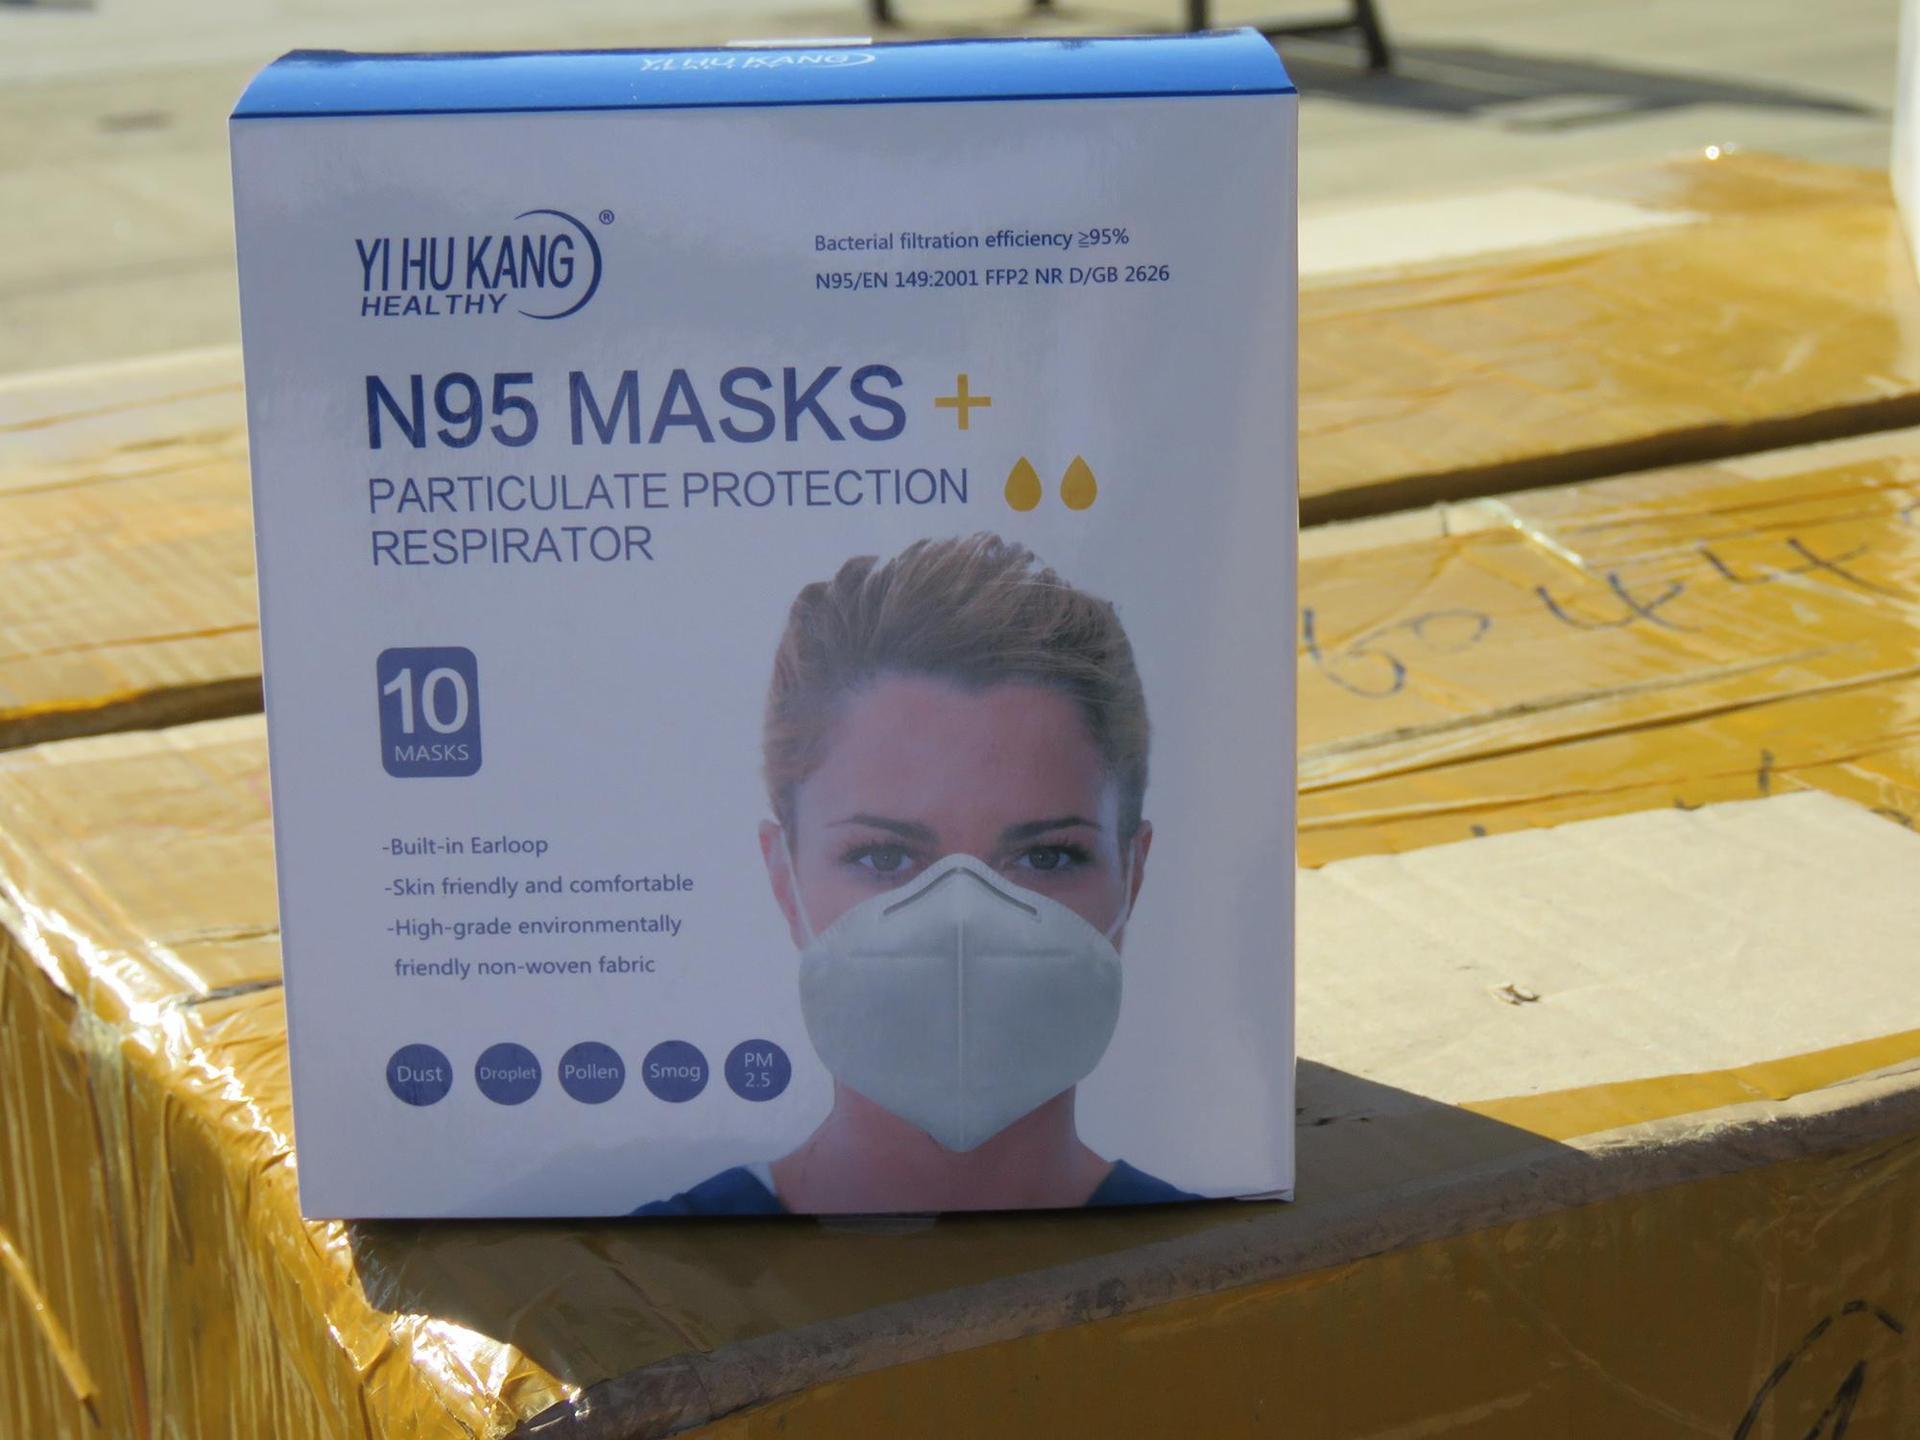 A close-up of a box of reusable n95 masks